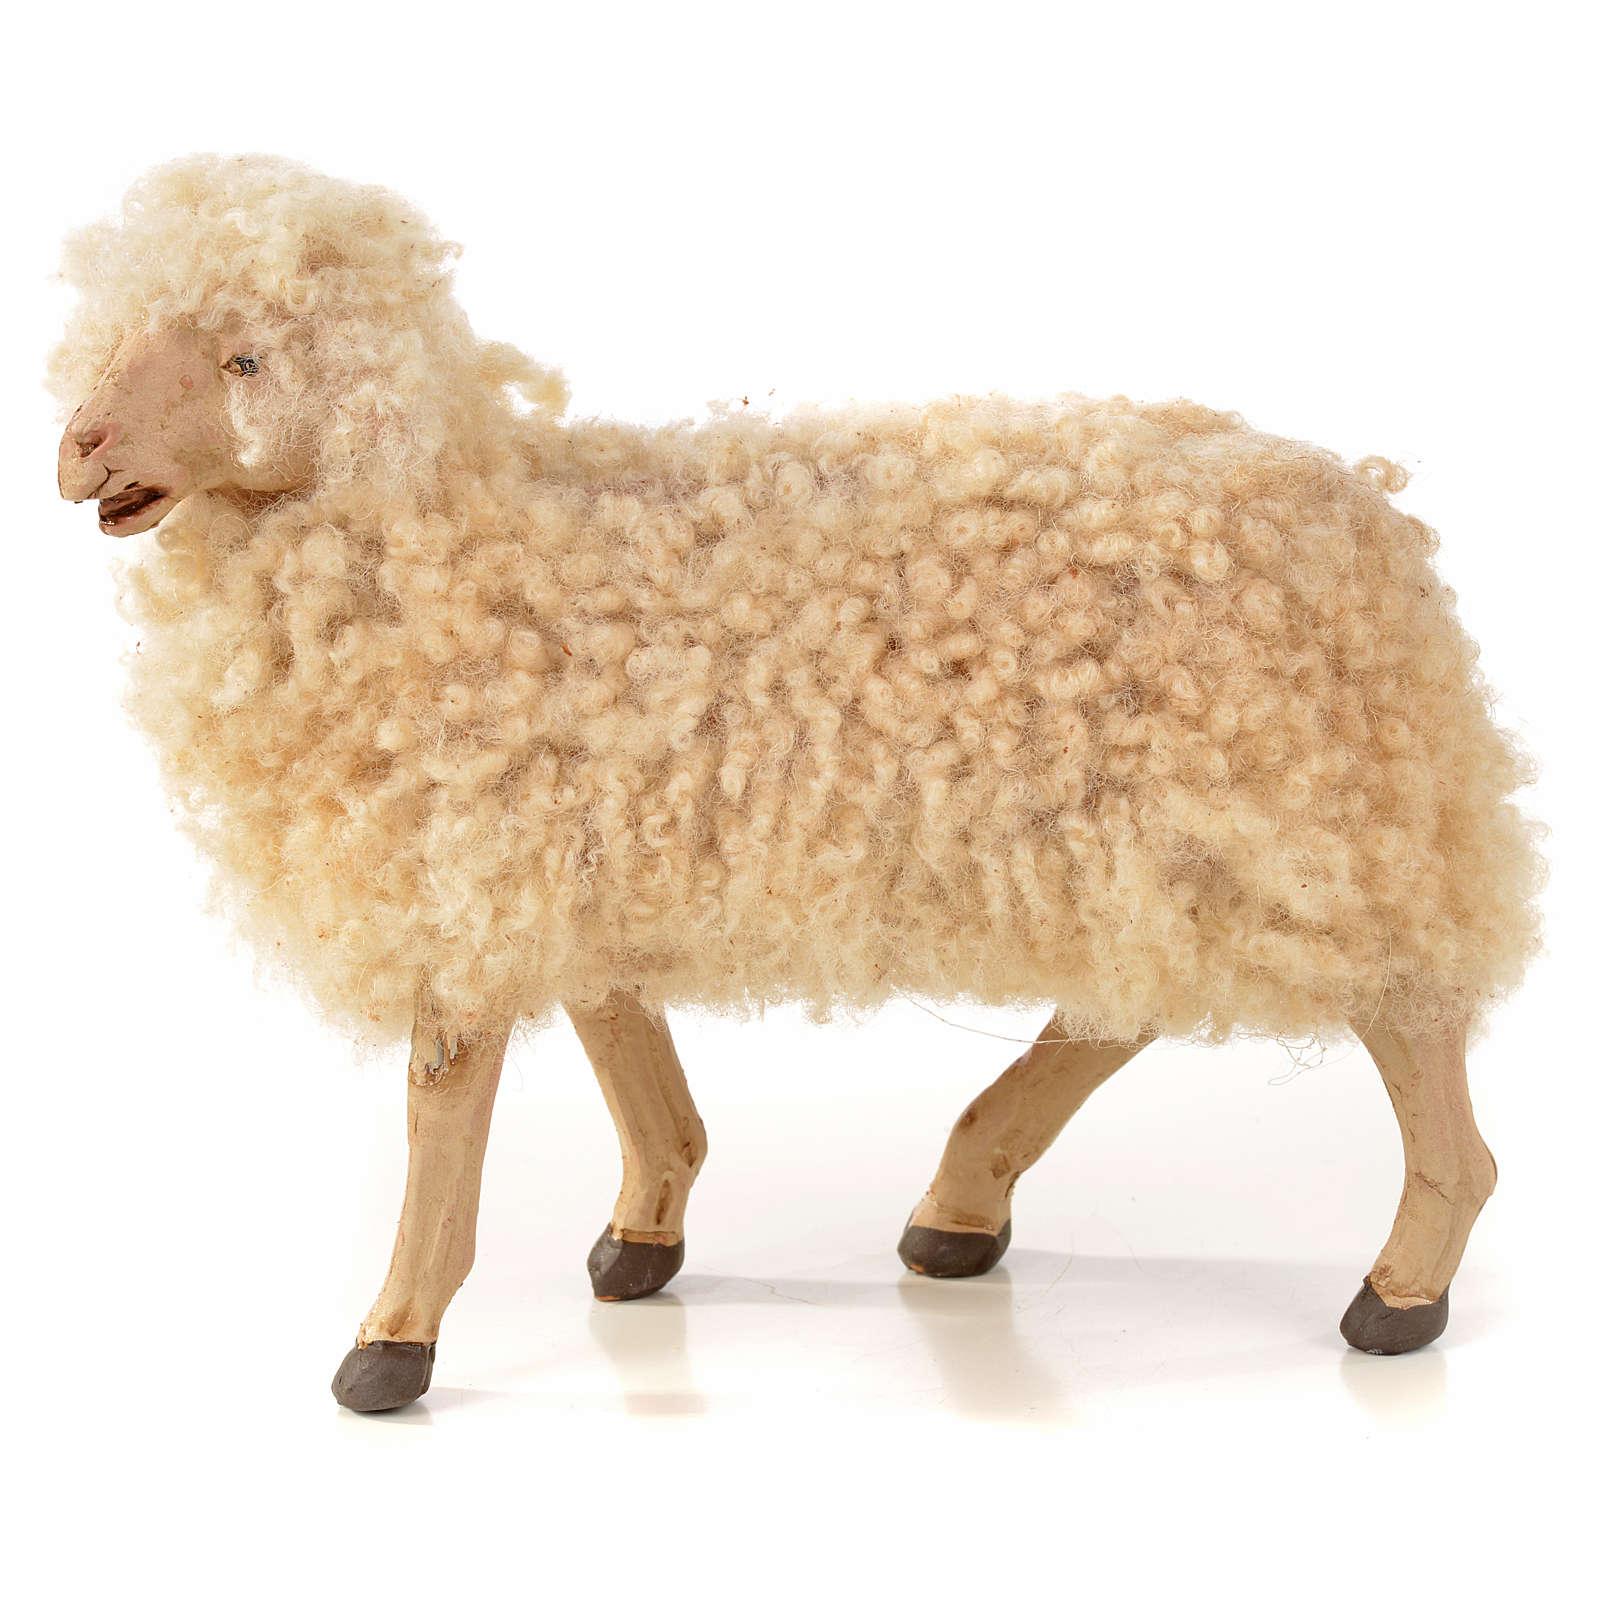 Kit 3 ovejas con lana para belén Napolitano con figuras de altura media 22 cm 4